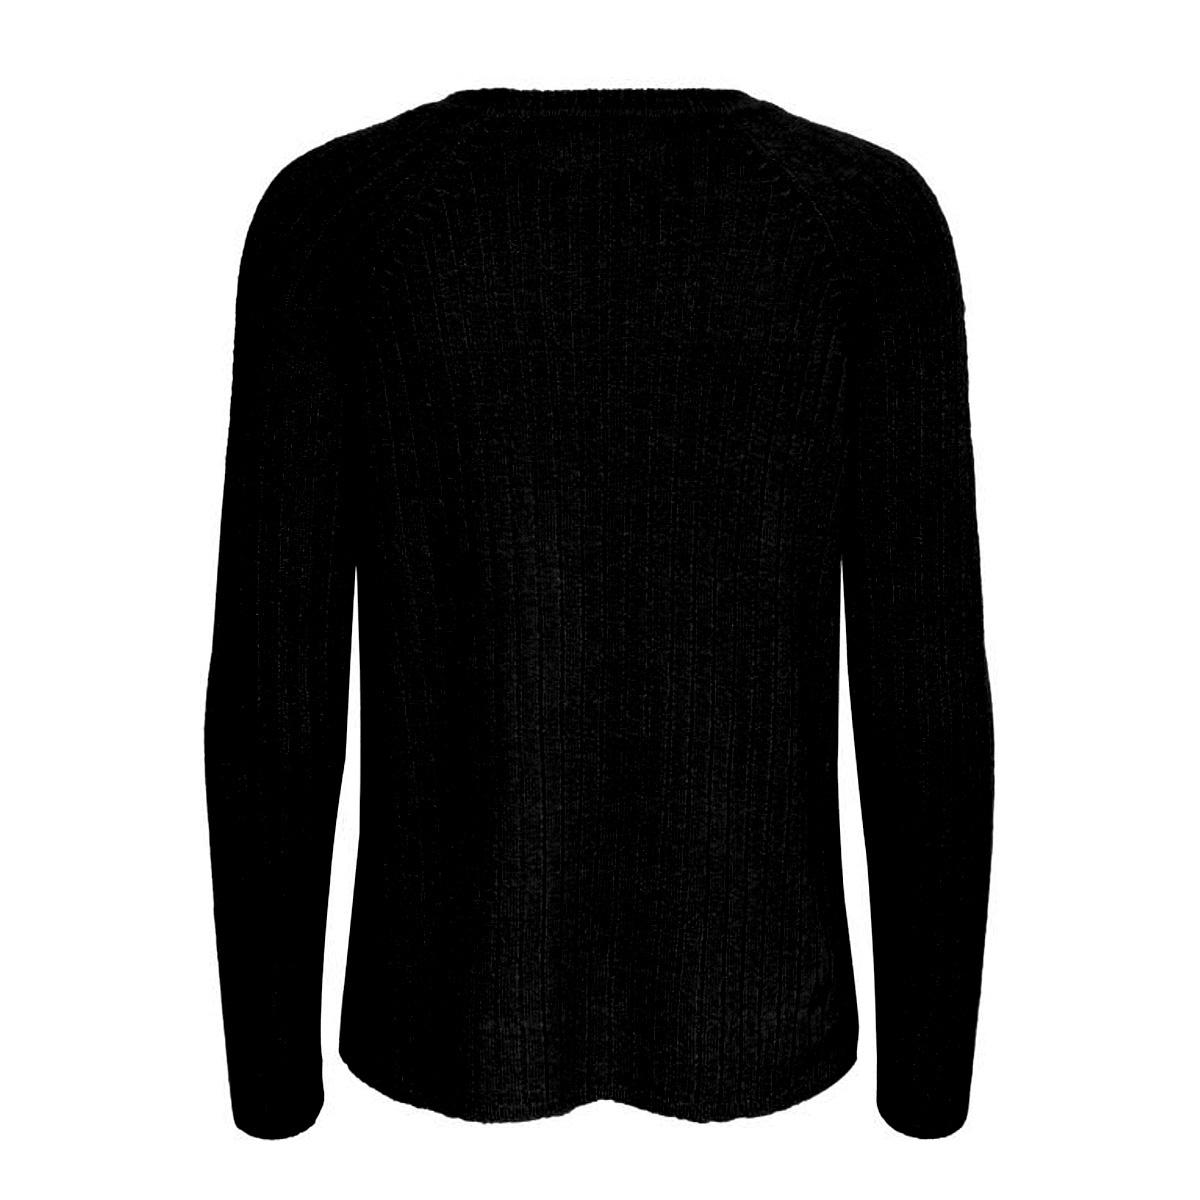 onlnadine l/s pullover knt 15192435 only trui black